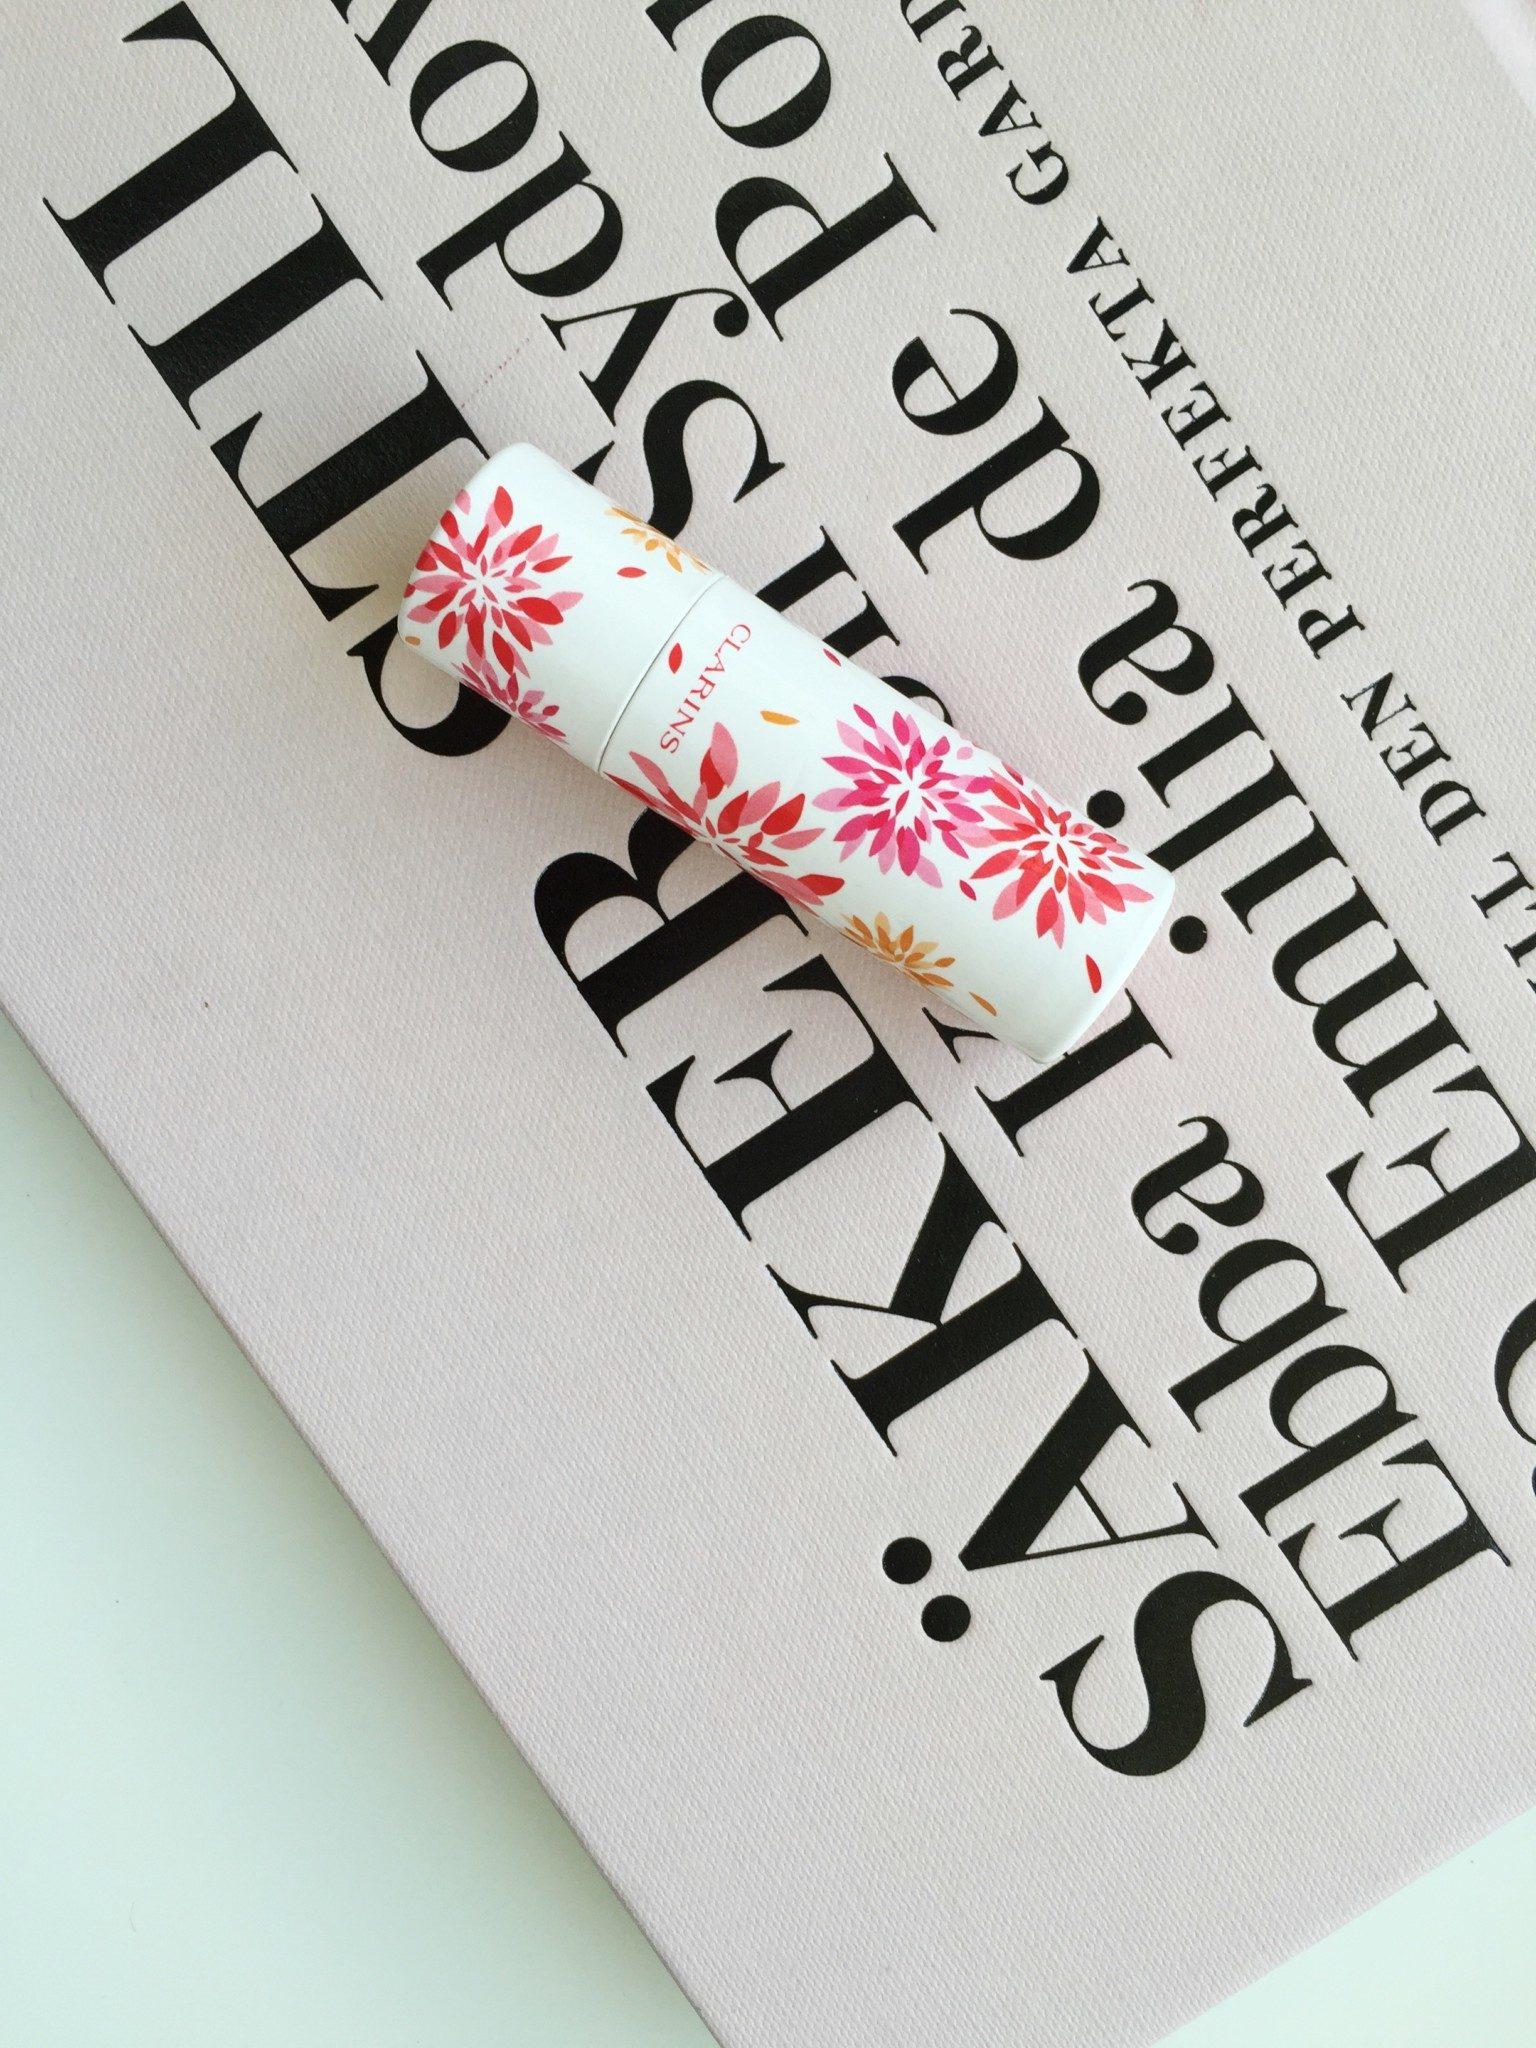 Clarins Daily Energiser - Lovely Lip Balm